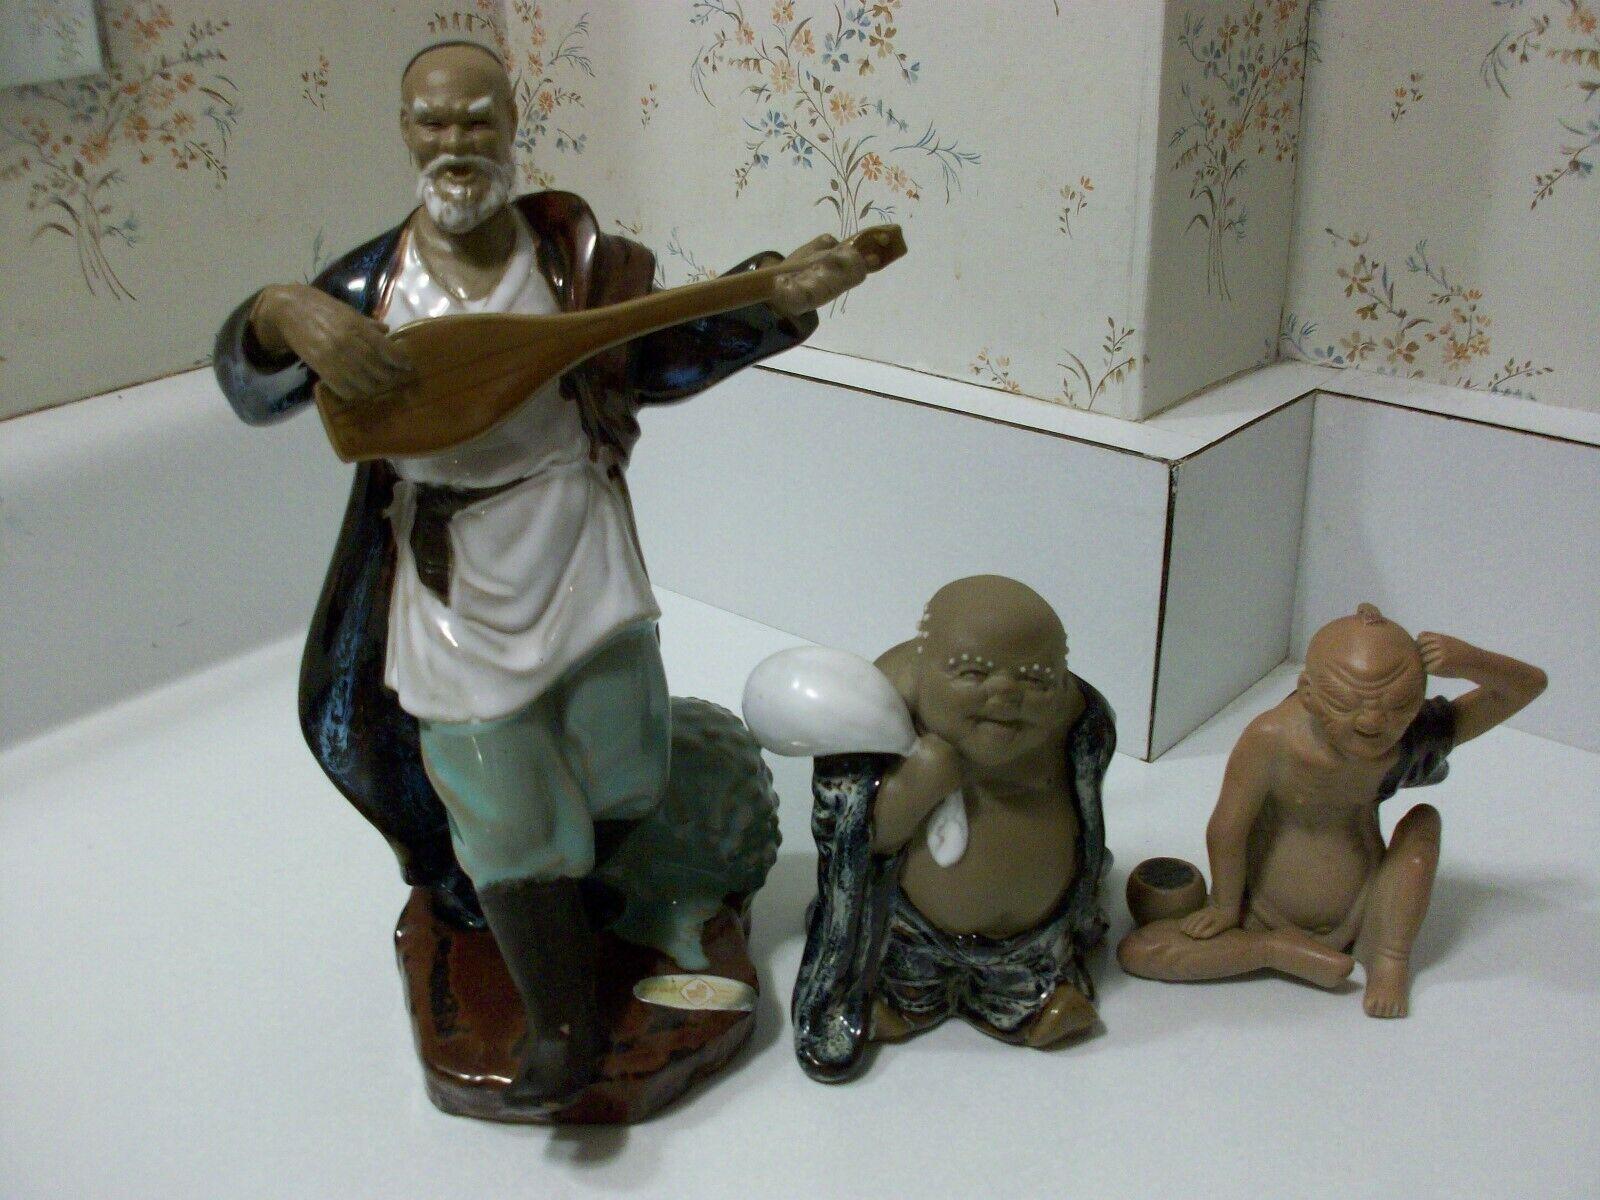 Vtg Lot Chinese Shiwan Clay Mudmen Oriental Asian Mudman Statue Figure Figurines - $19.99